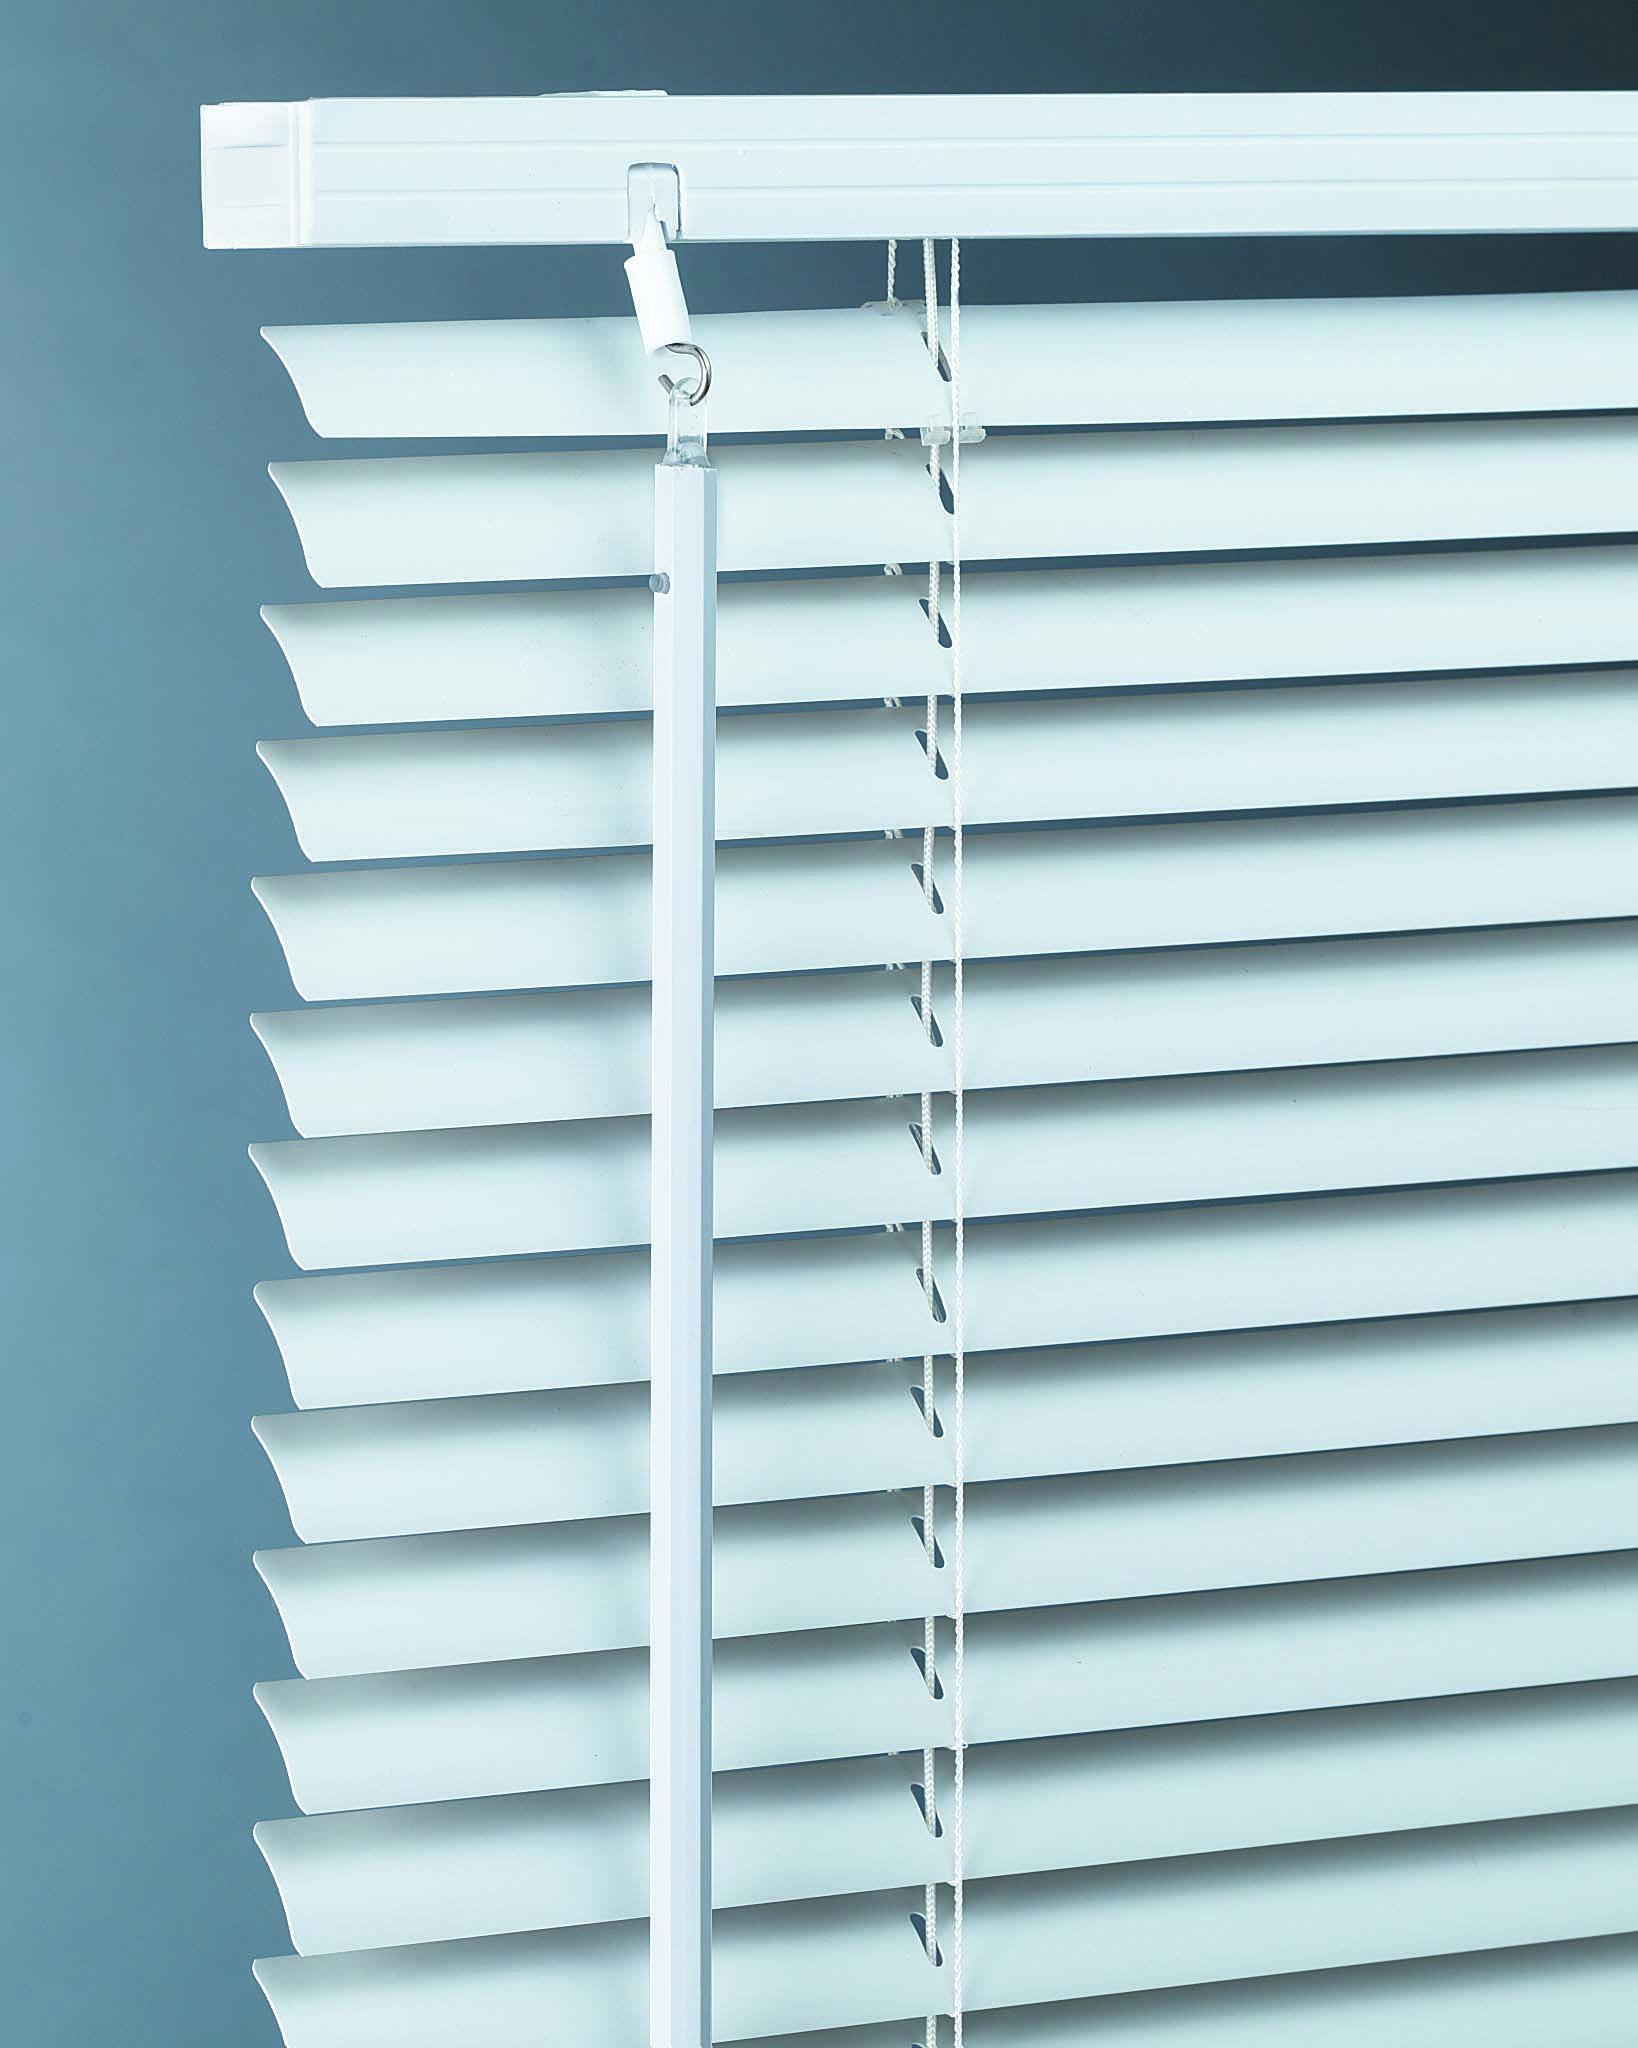 Aluminum slats for 25mm venetian shutters buy aluminium - Effigy Of Most Common Types Of Window Blinds